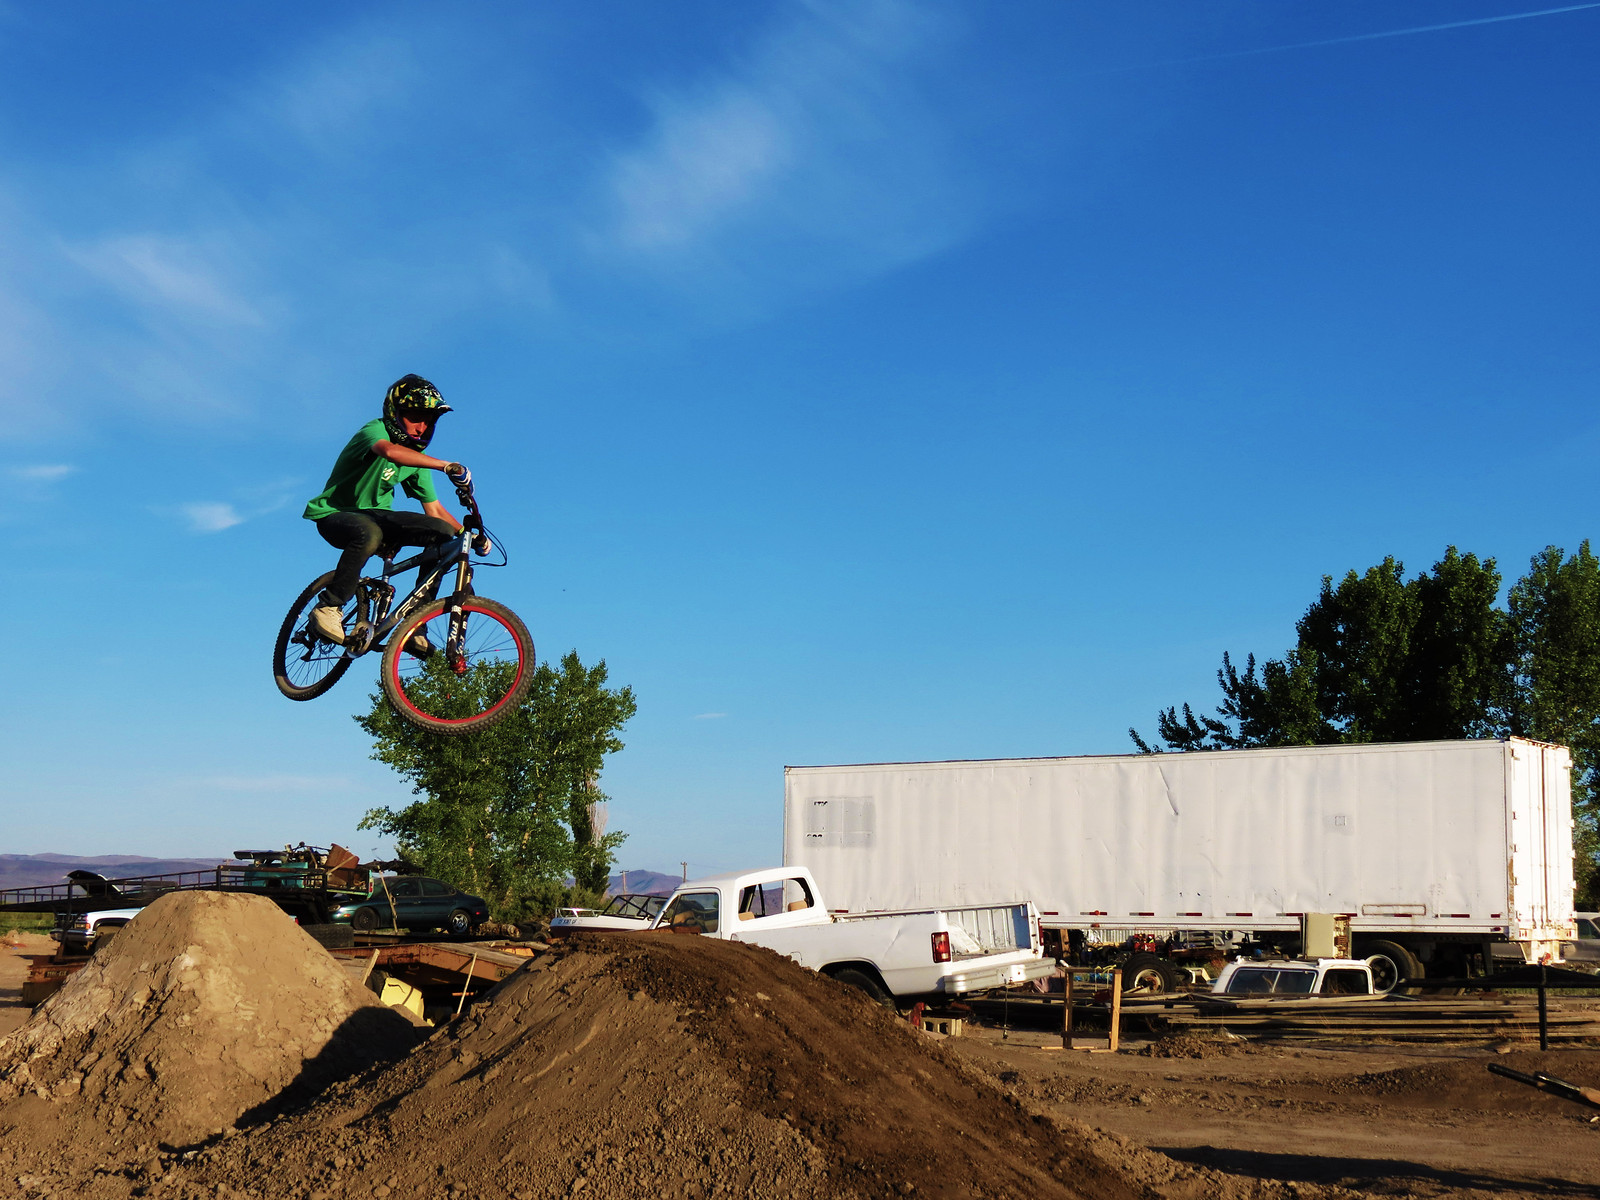 day 4 005 - Moosey - Mountain Biking Pictures - Vital MTB